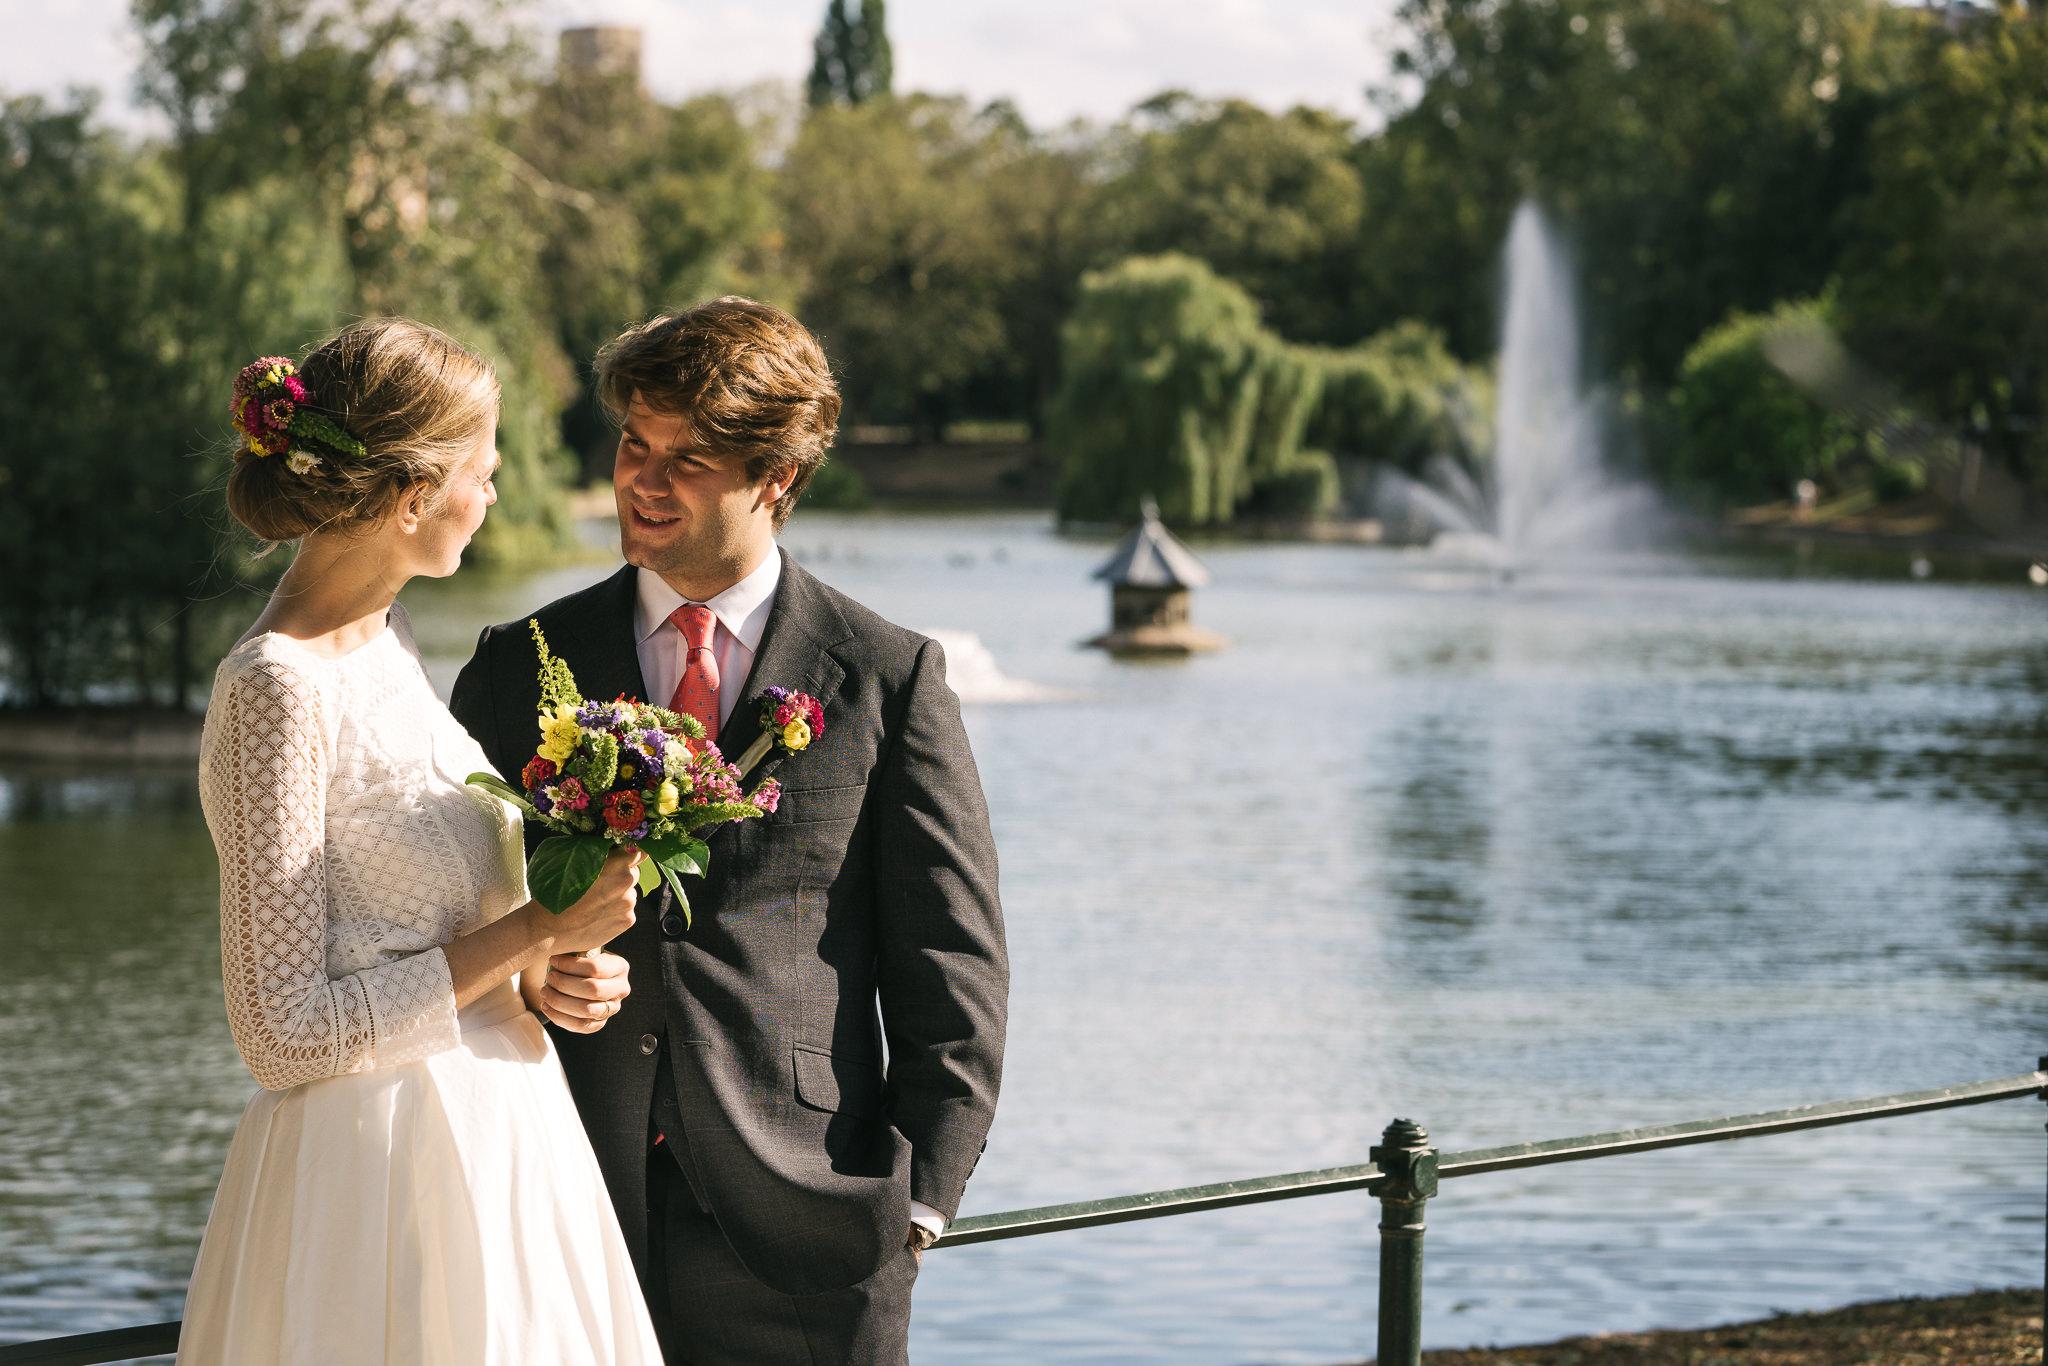 Wedding-Claudia&Philipp-15092018-small-147.jpg